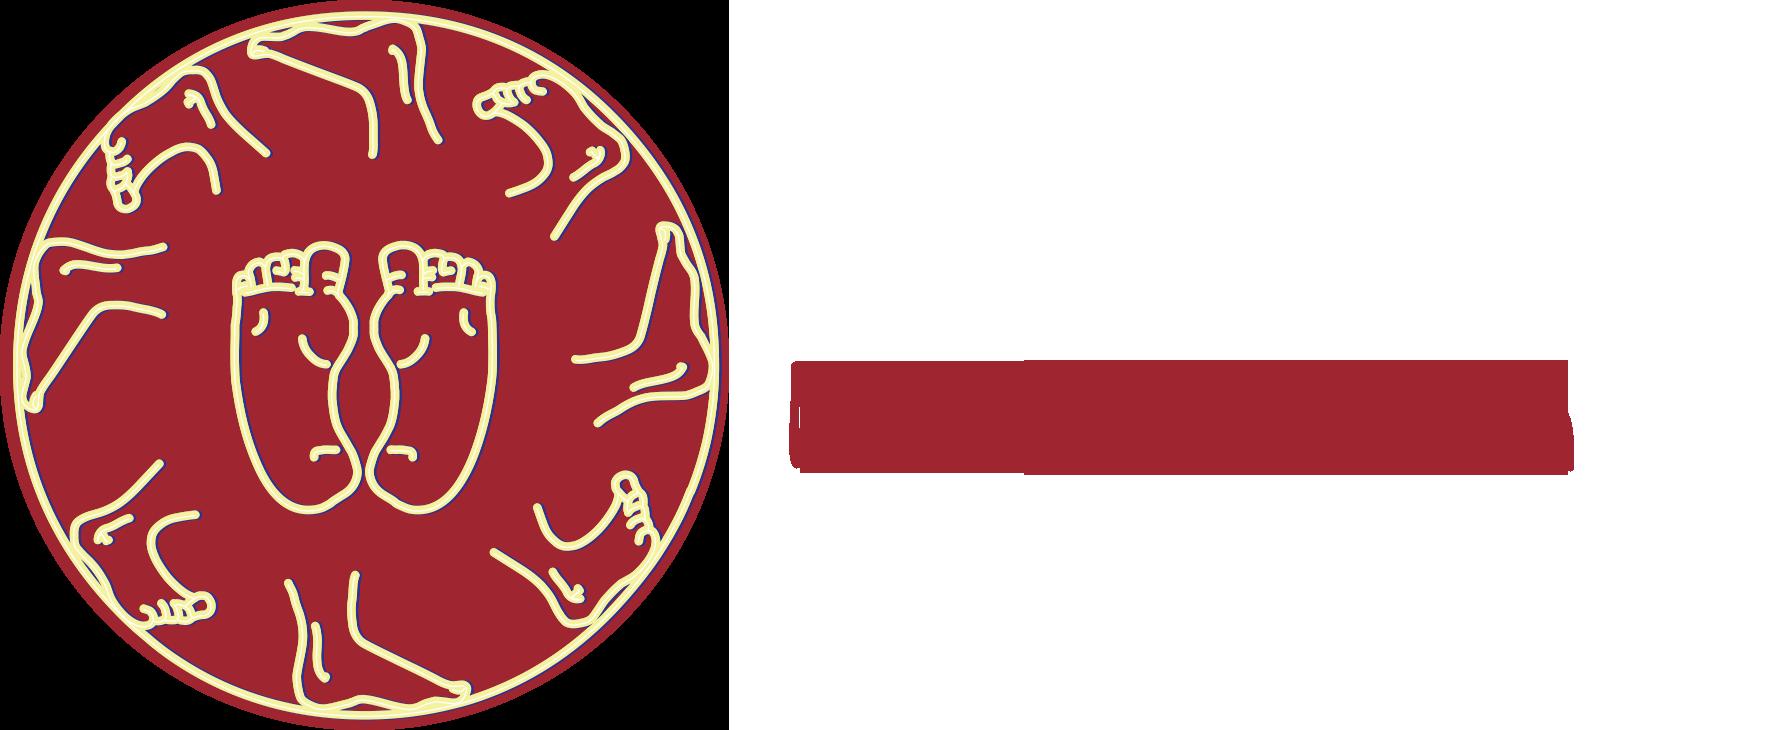 Michaela Hahn